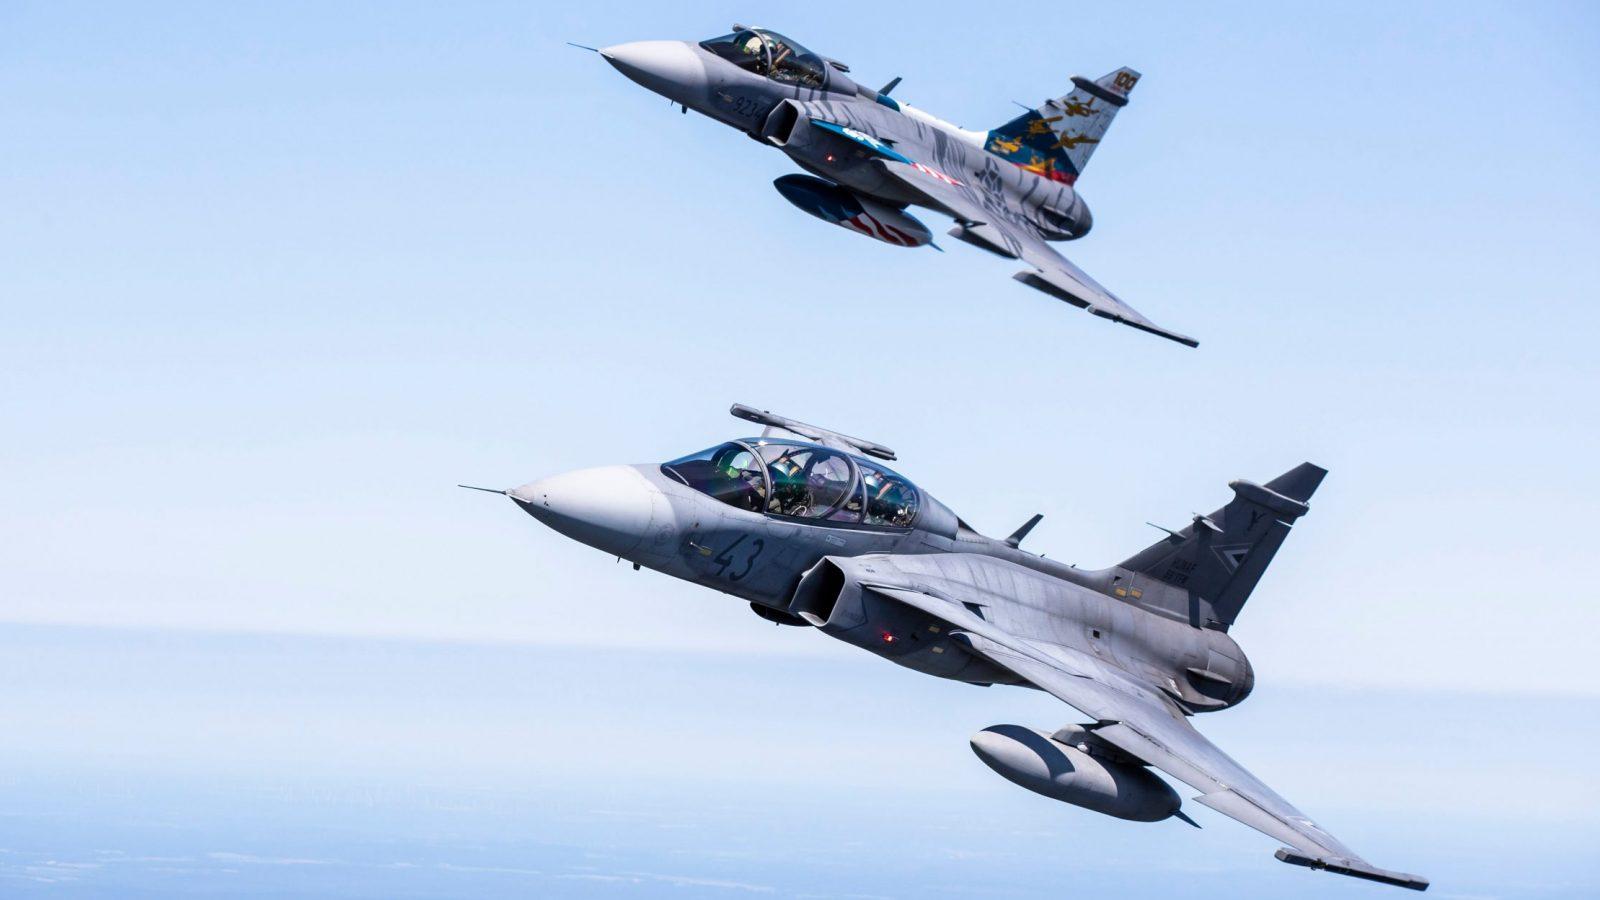 Švedska od SAAB-a naručila buduću razvojnu podršku za avion Gripen